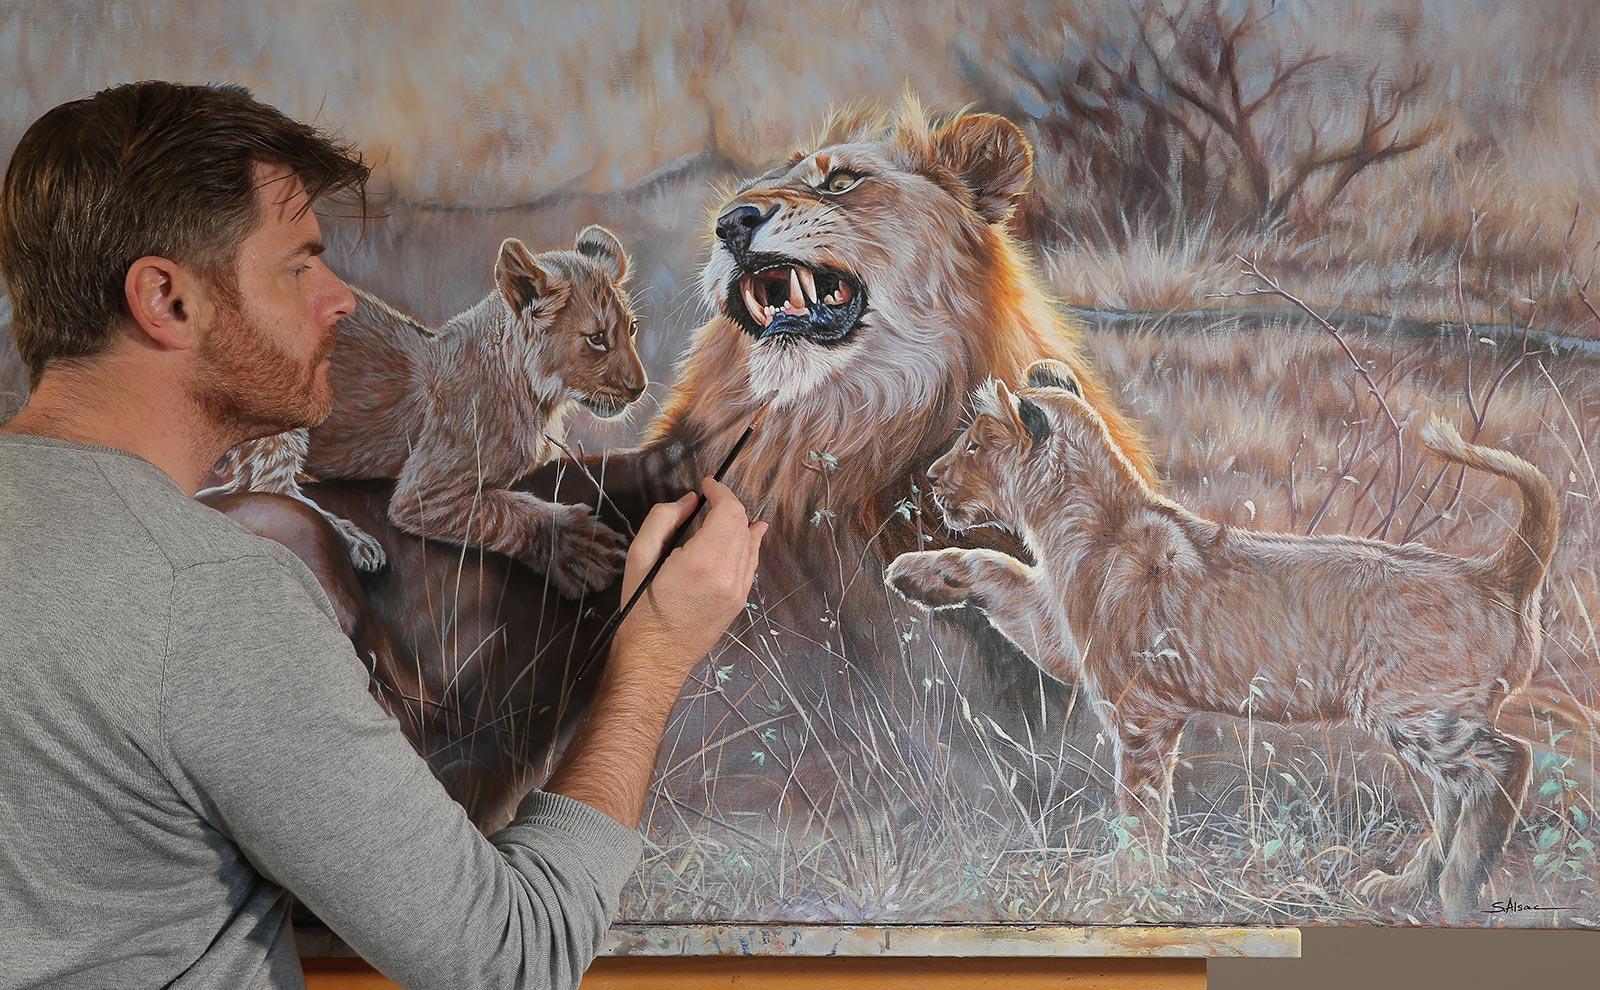 Stephane Alsac Artiste Peintre Animalier Hyper Realiste Stephane Alsac